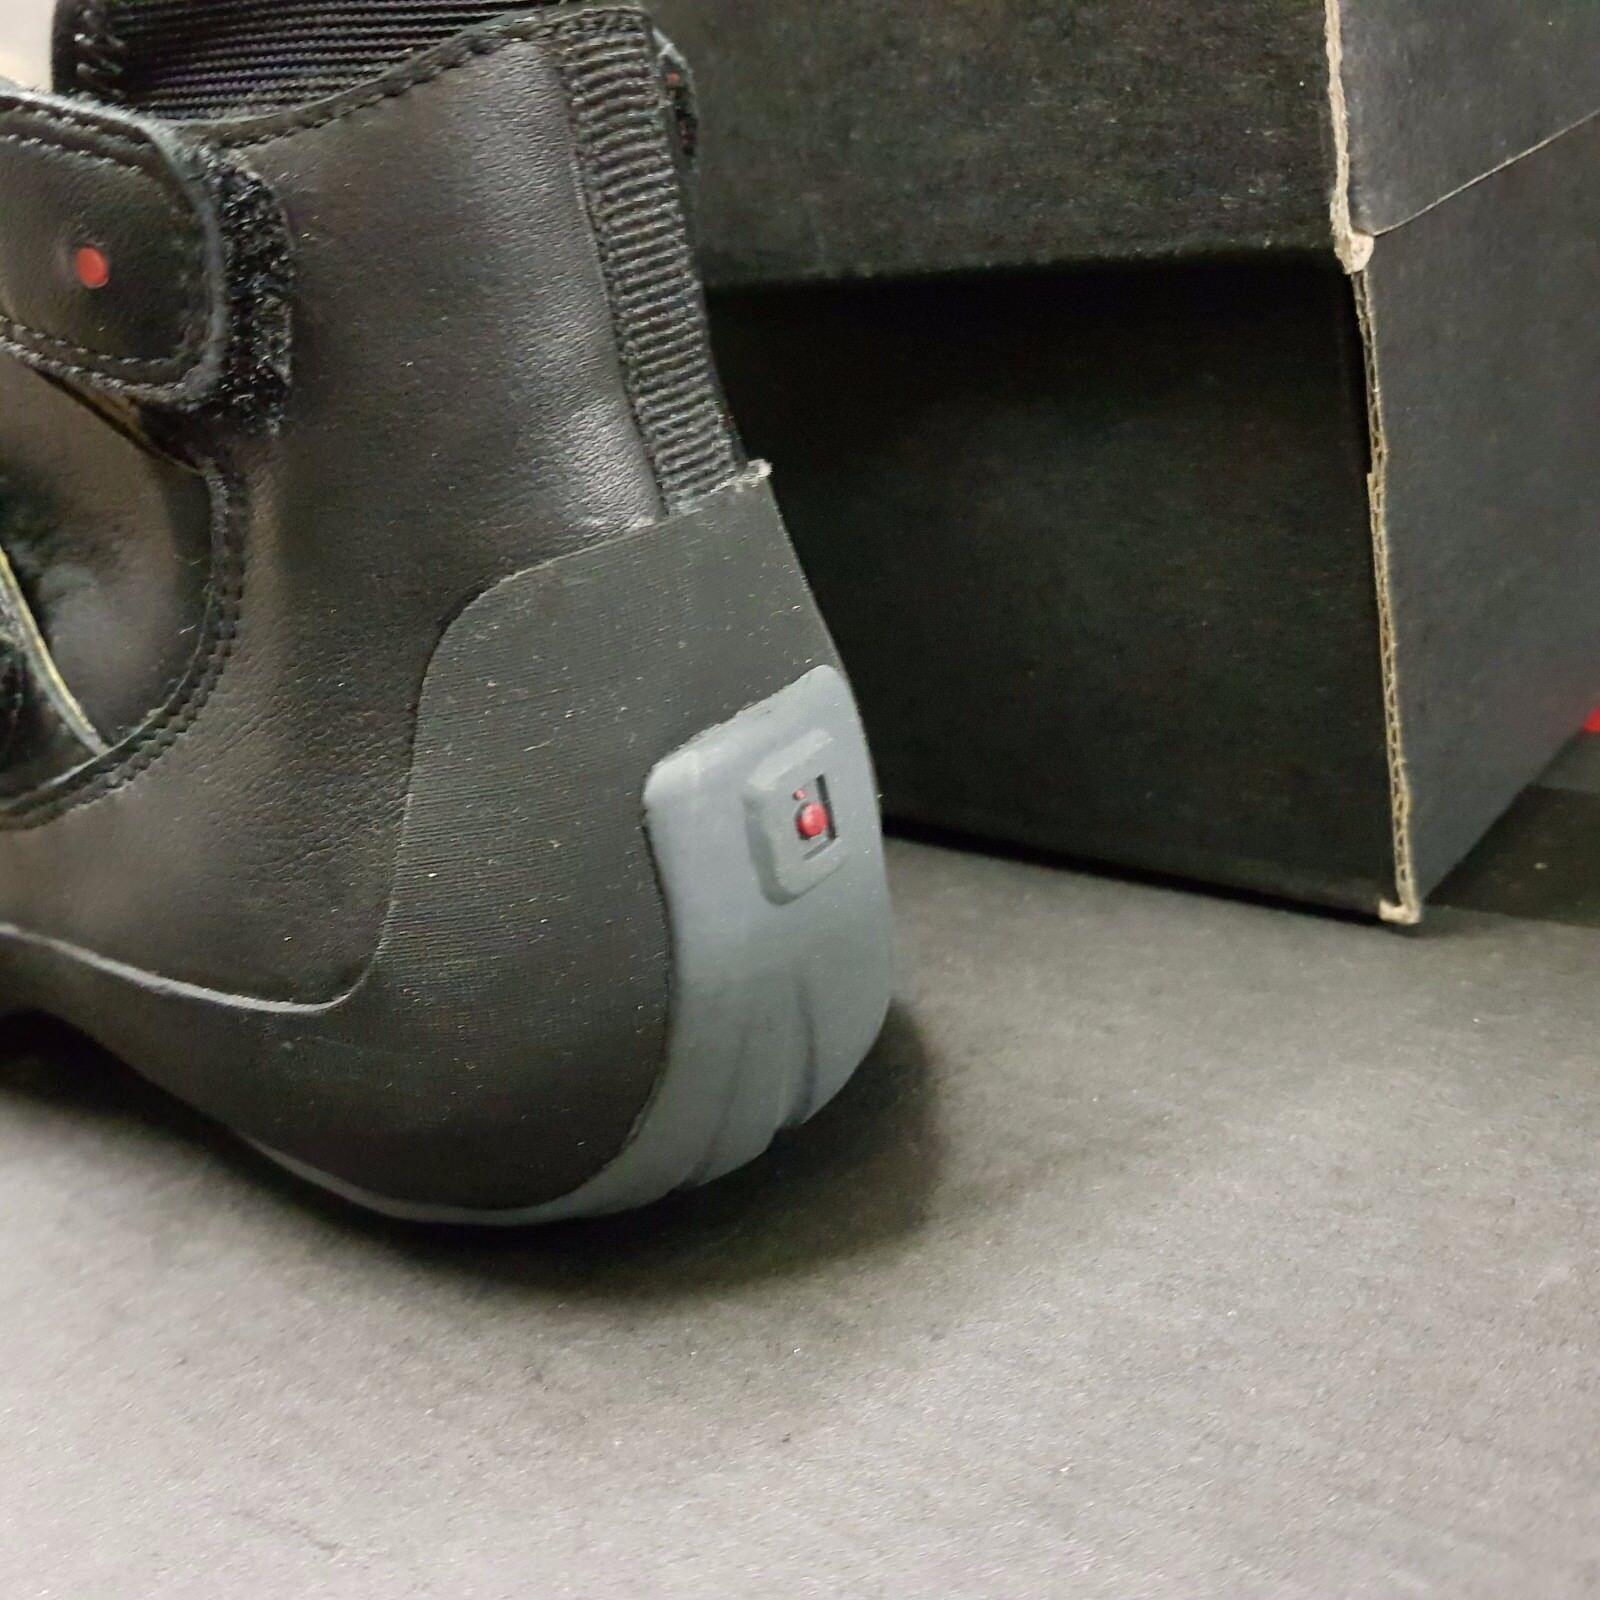 TSUBO Noma mujer city zapatos botas botas botas leather US 7 UK 5,5 EUR 38 (rrp  ) d48929